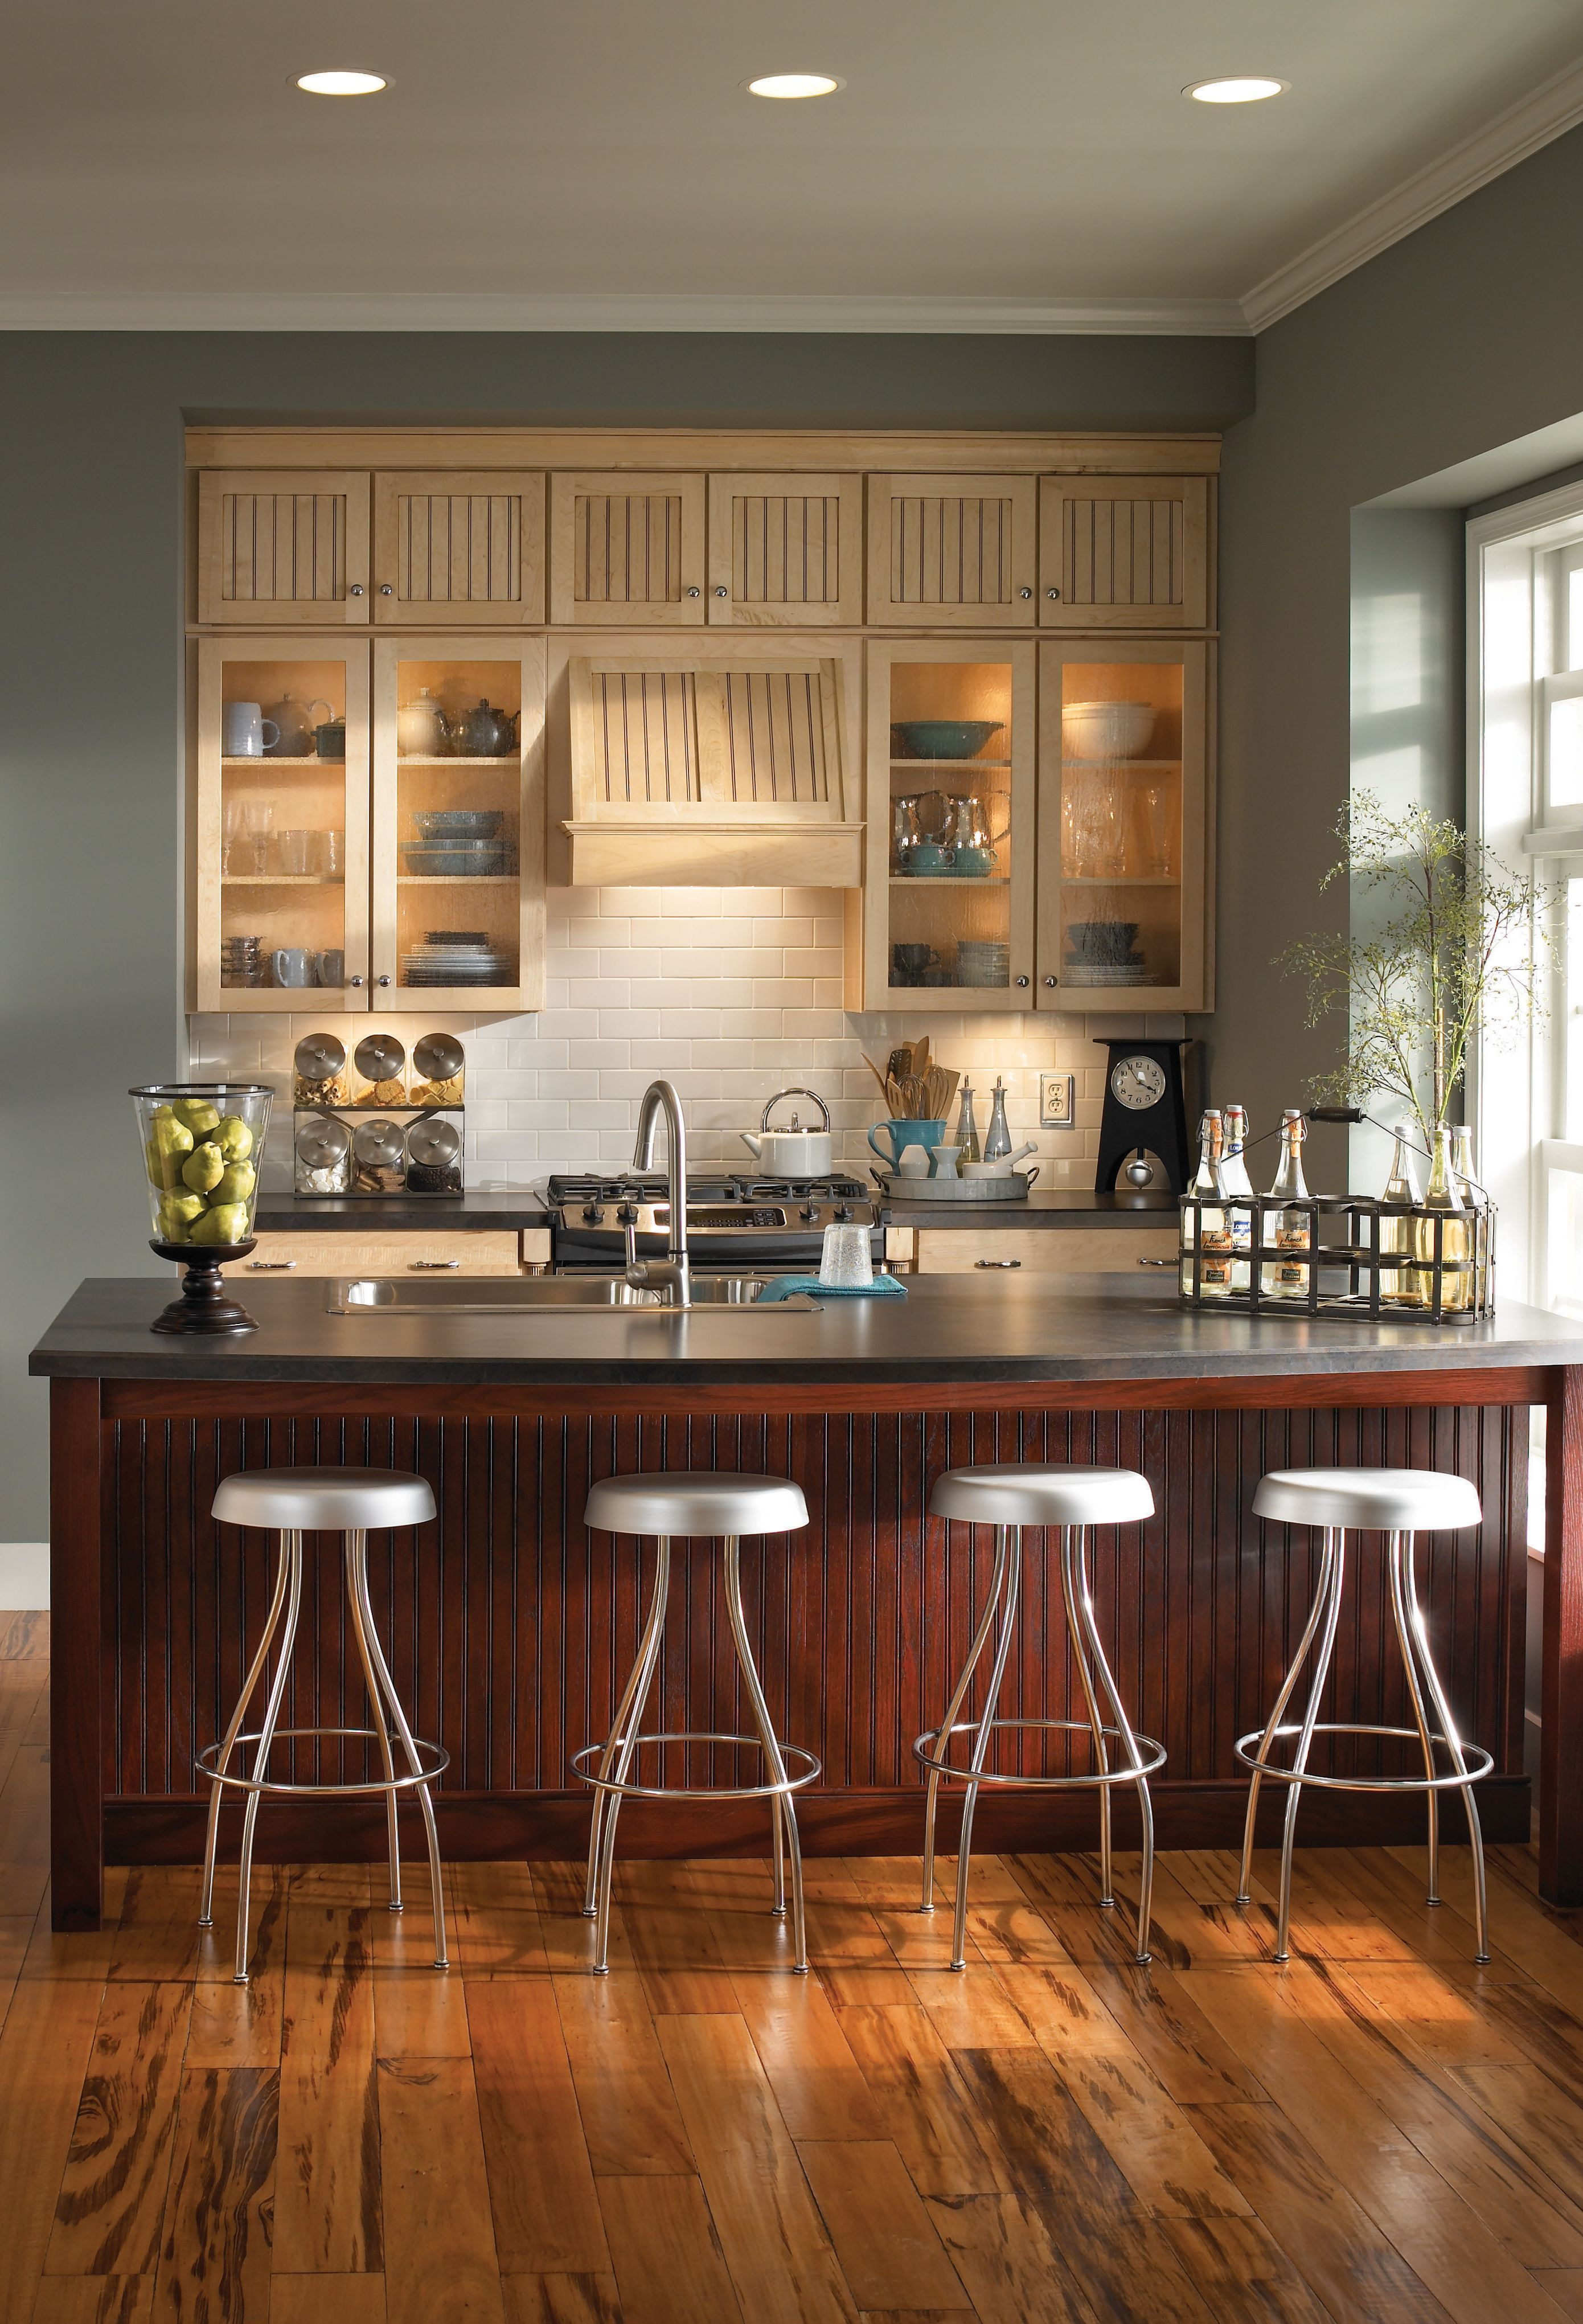 Medallion At Menards Cabinets Kitchen And Bath Cabinetry Provence Kitchen Kitchen Renovation Inspiration Kitchen Inspirations